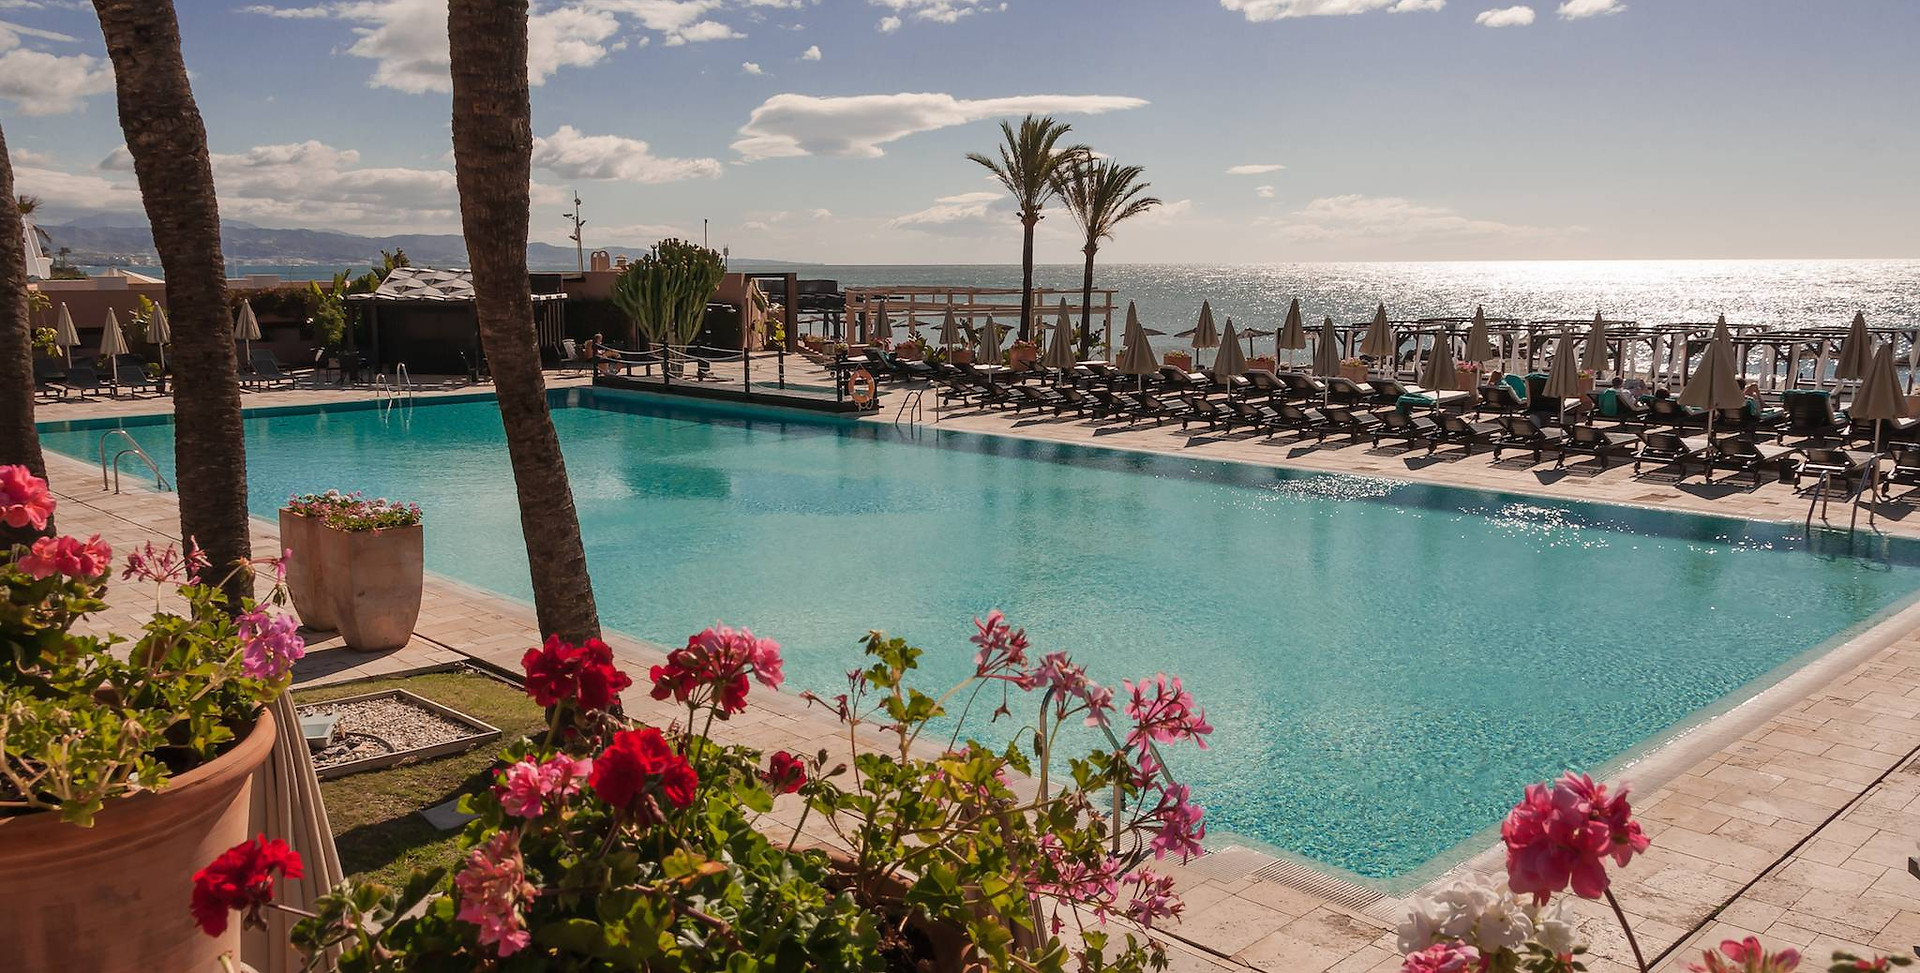 hotel-guadalmina-spa&golf-puregolf-2.jpg